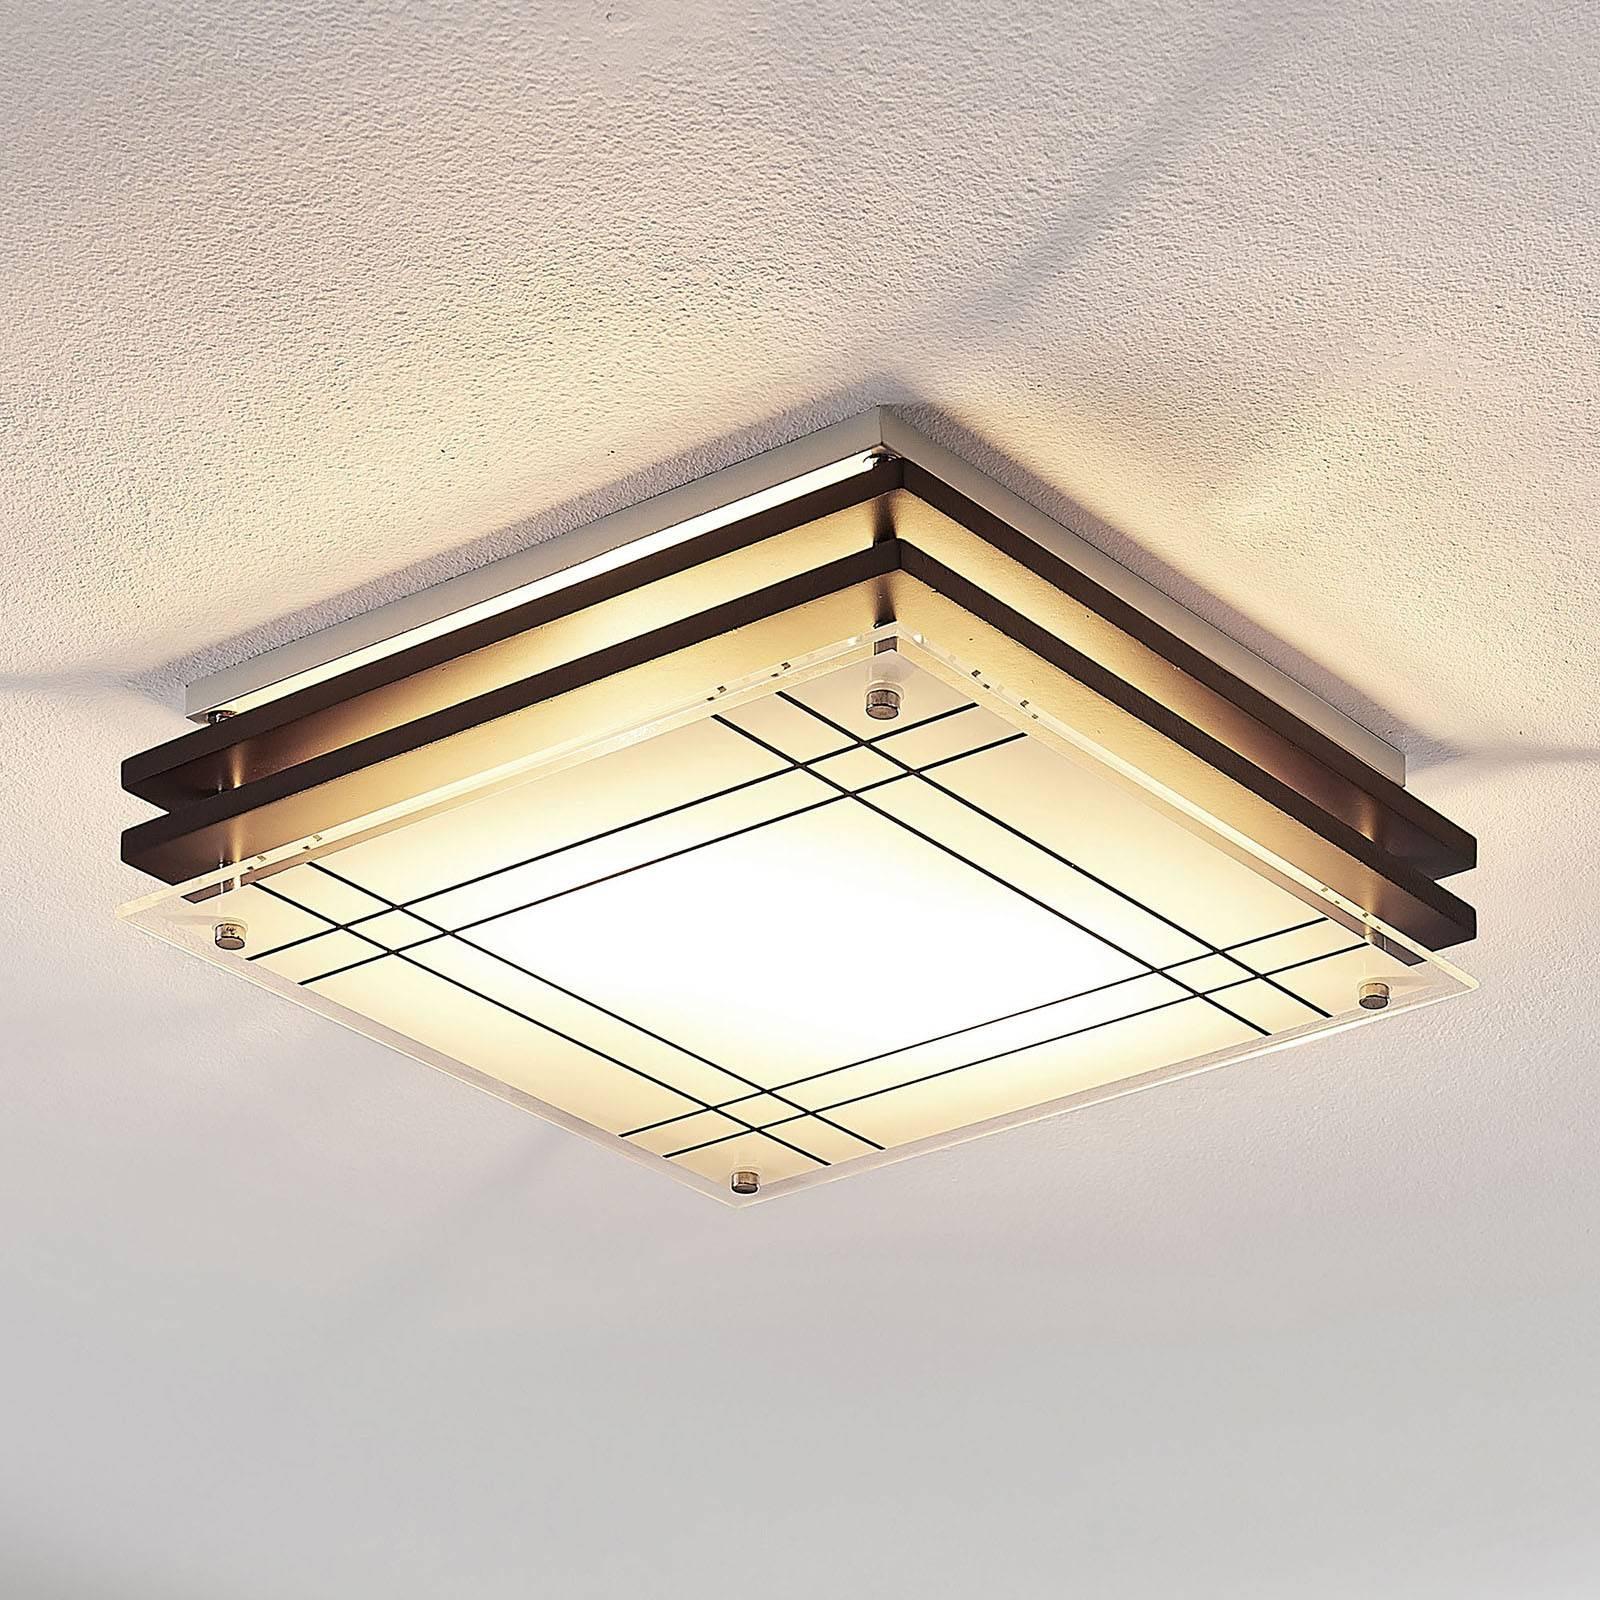 Houten plafondlamp Thees met geruit glas, 31 cm